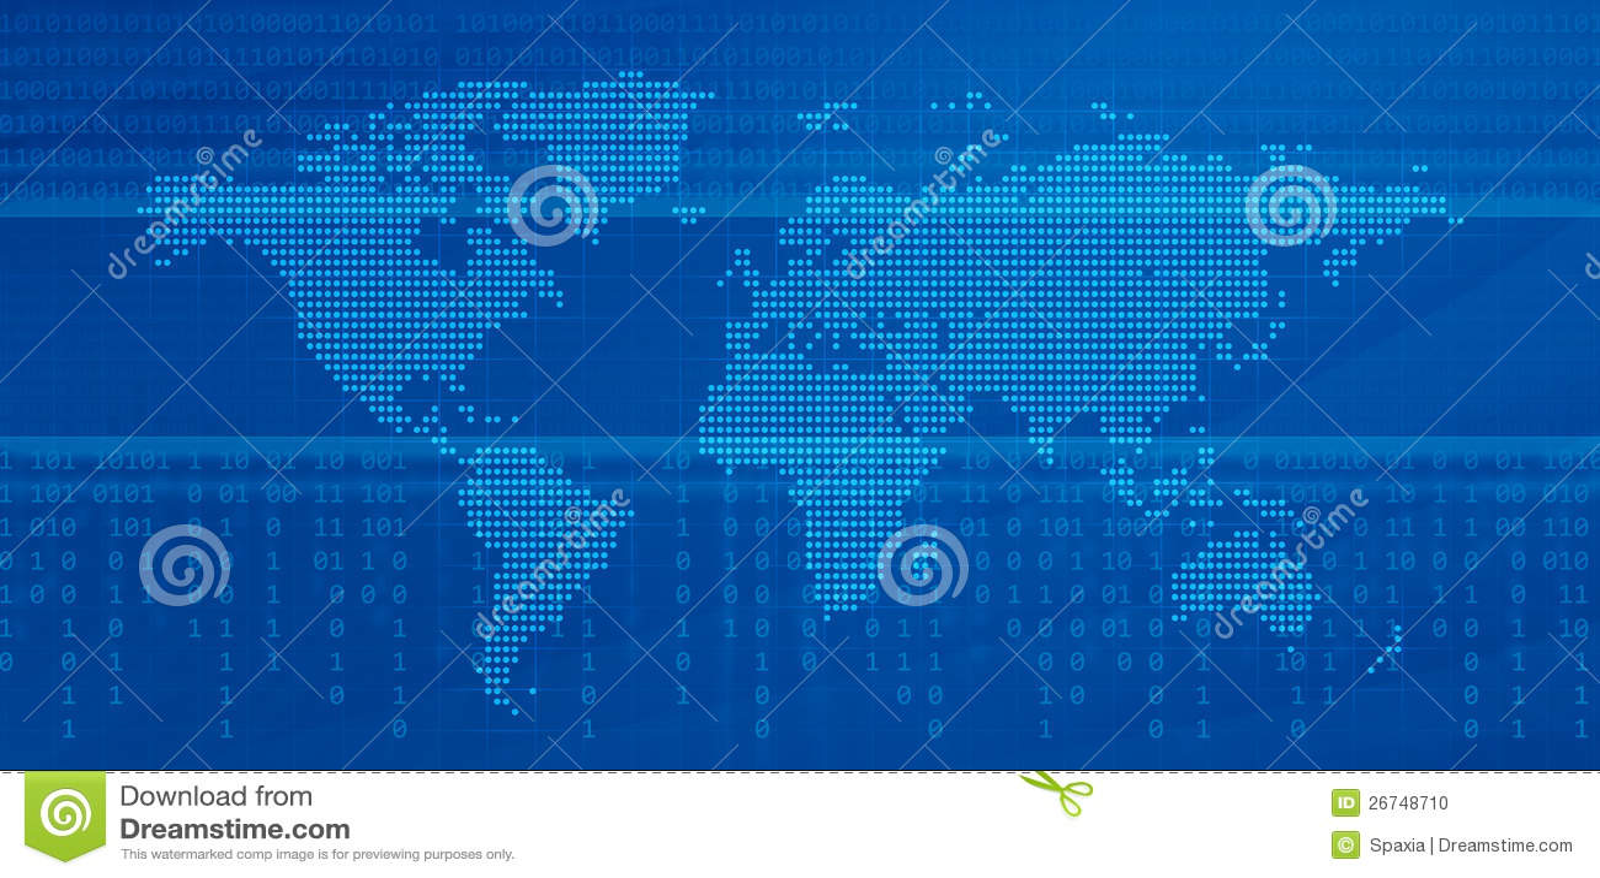 Binary Code Wallpaper Hd Digital World Map Stock Photo Image 26748710